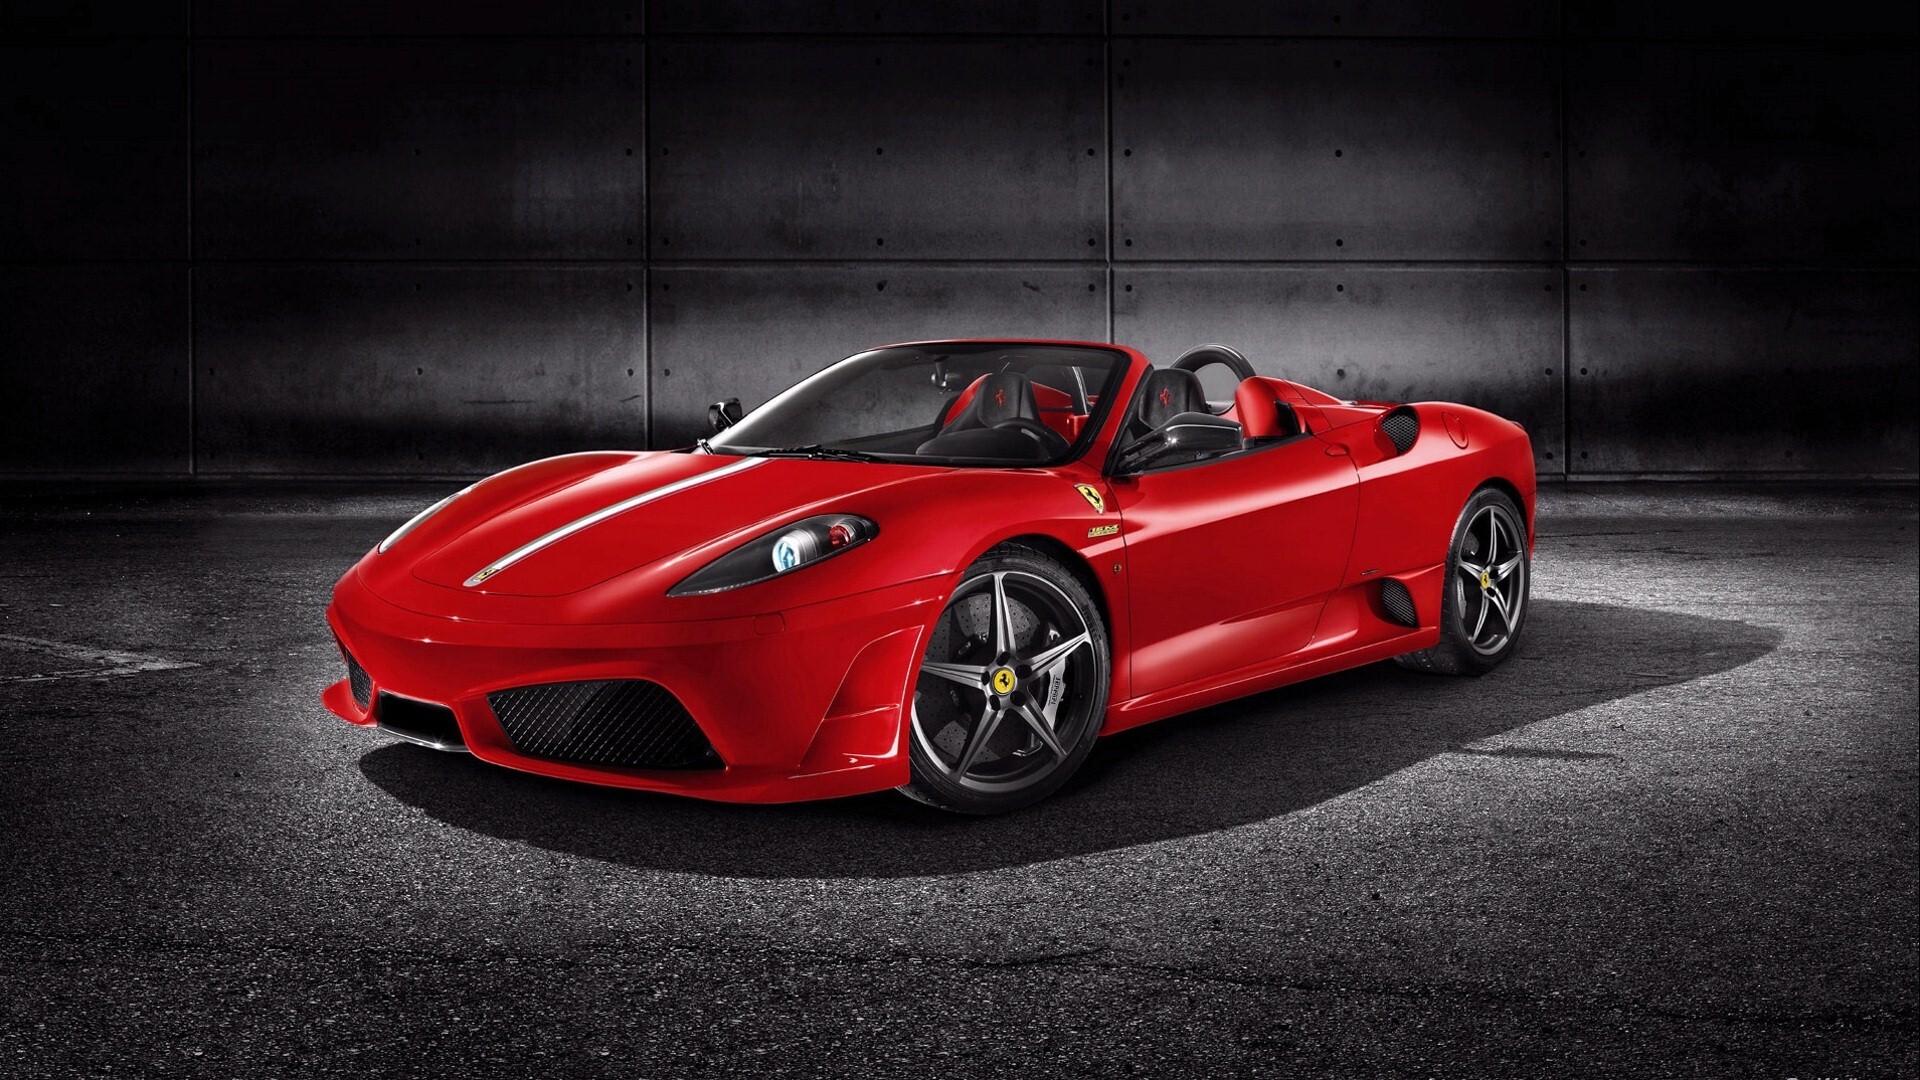 Ferrari Spider Beautiful Luxury Car Hd Wallpapers Background Hd